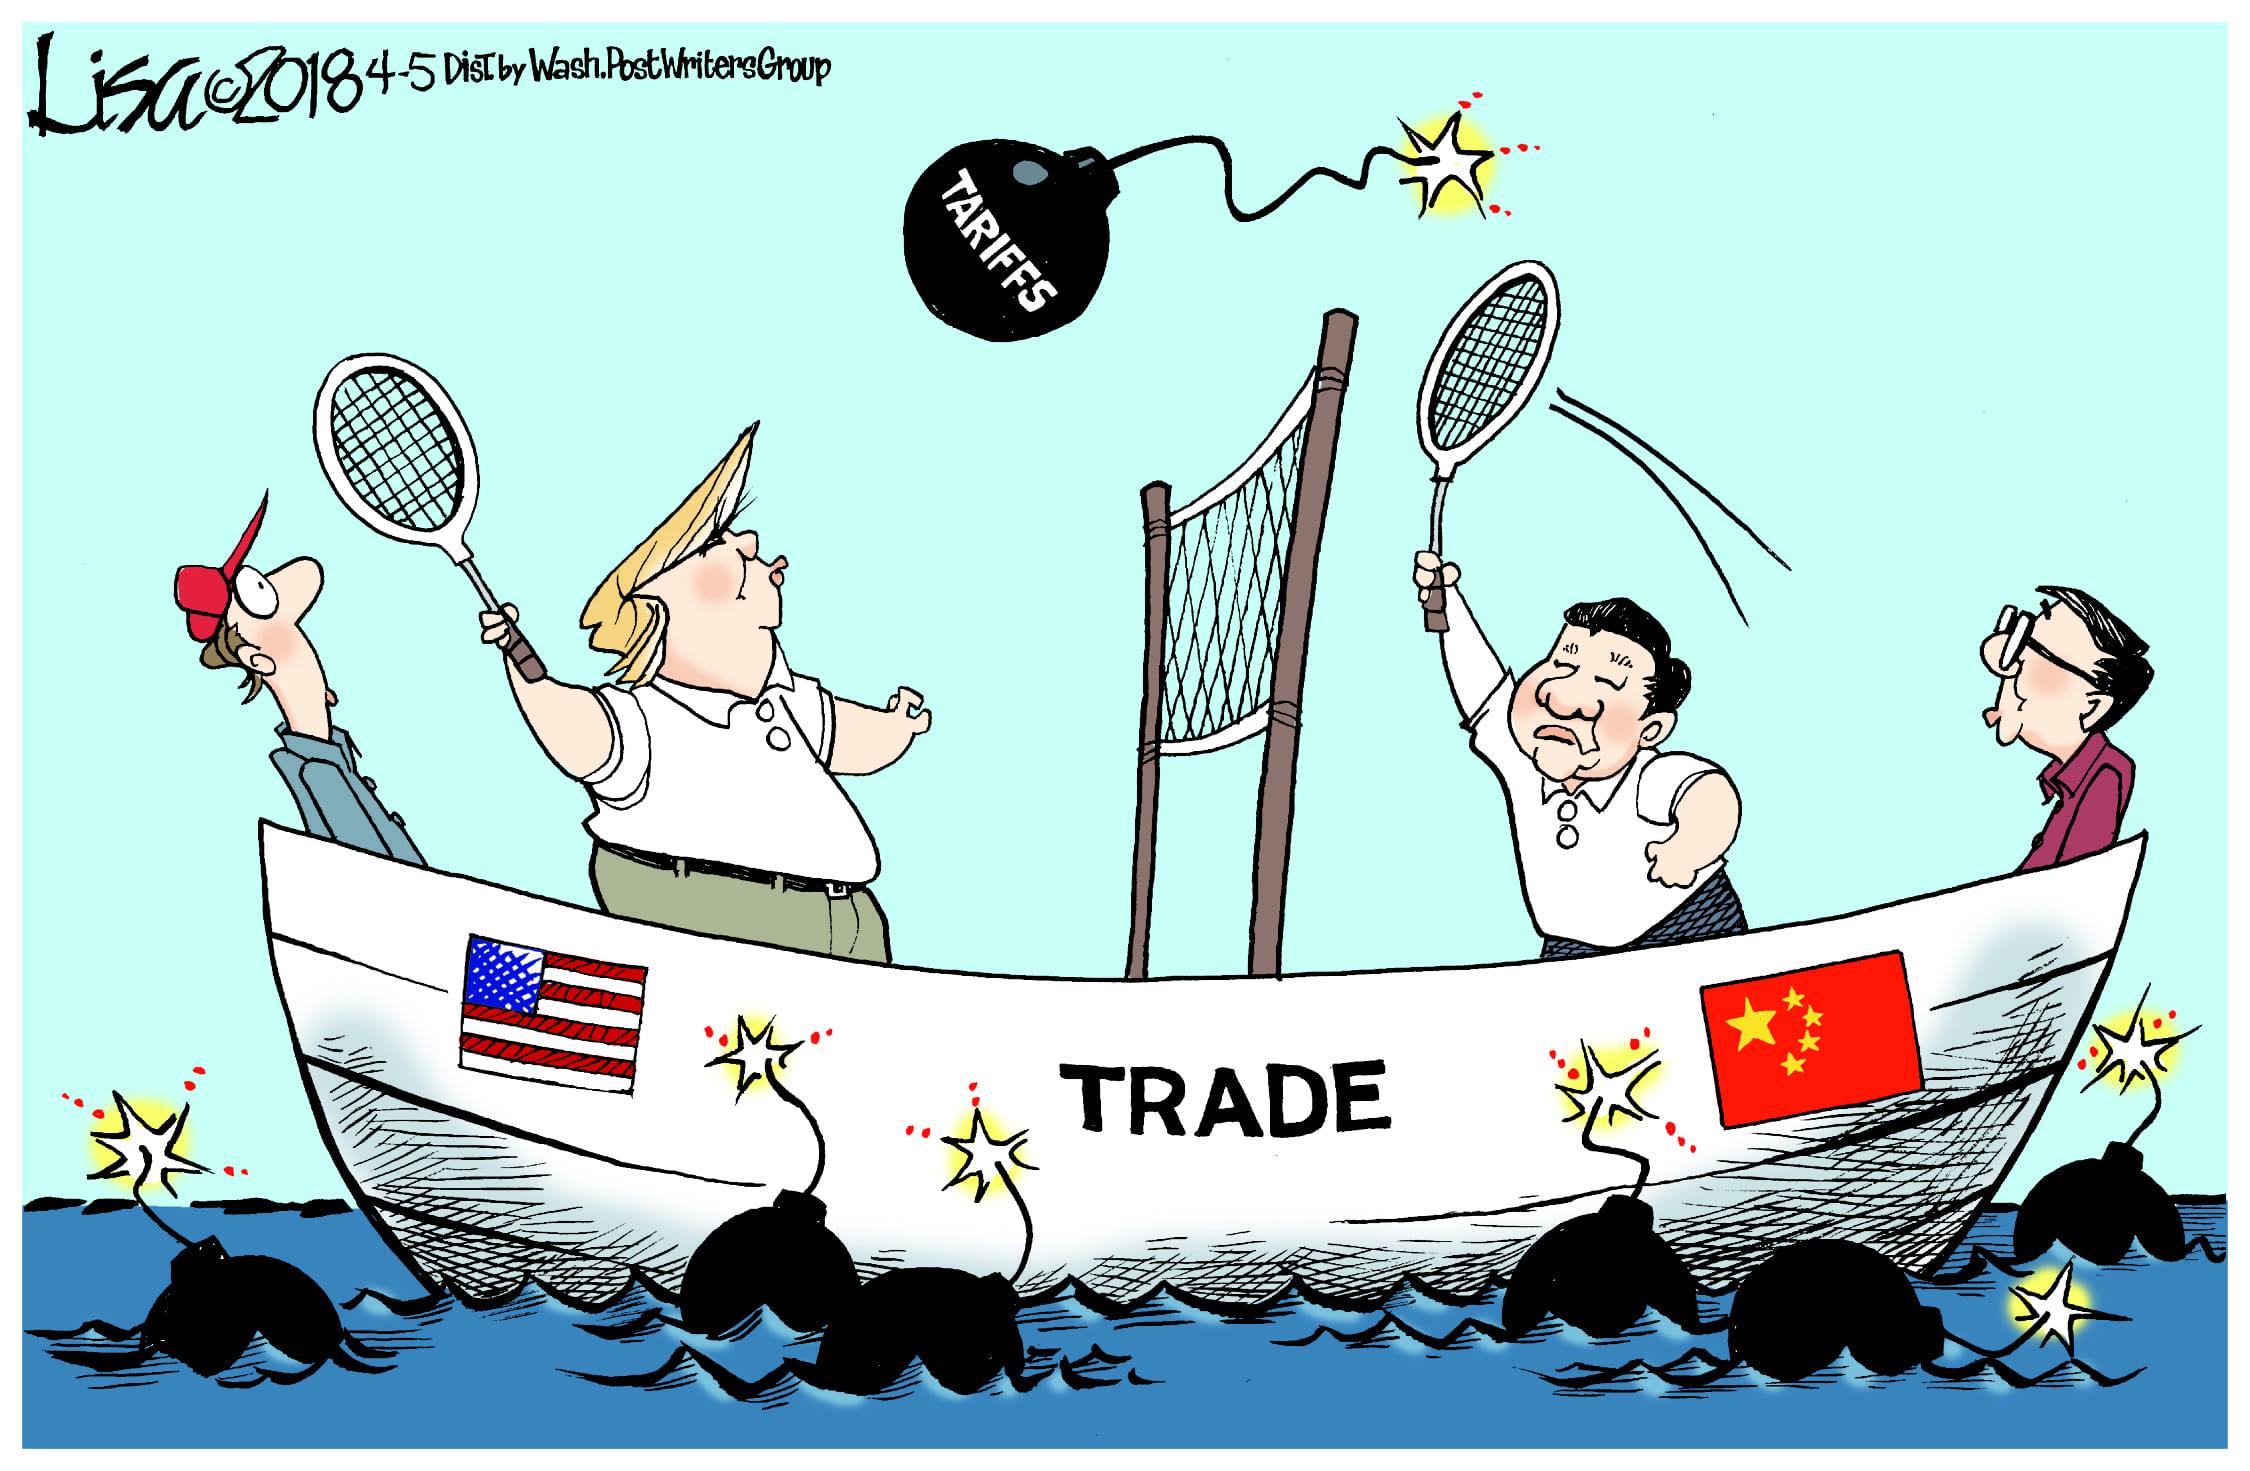 April 7: Trade